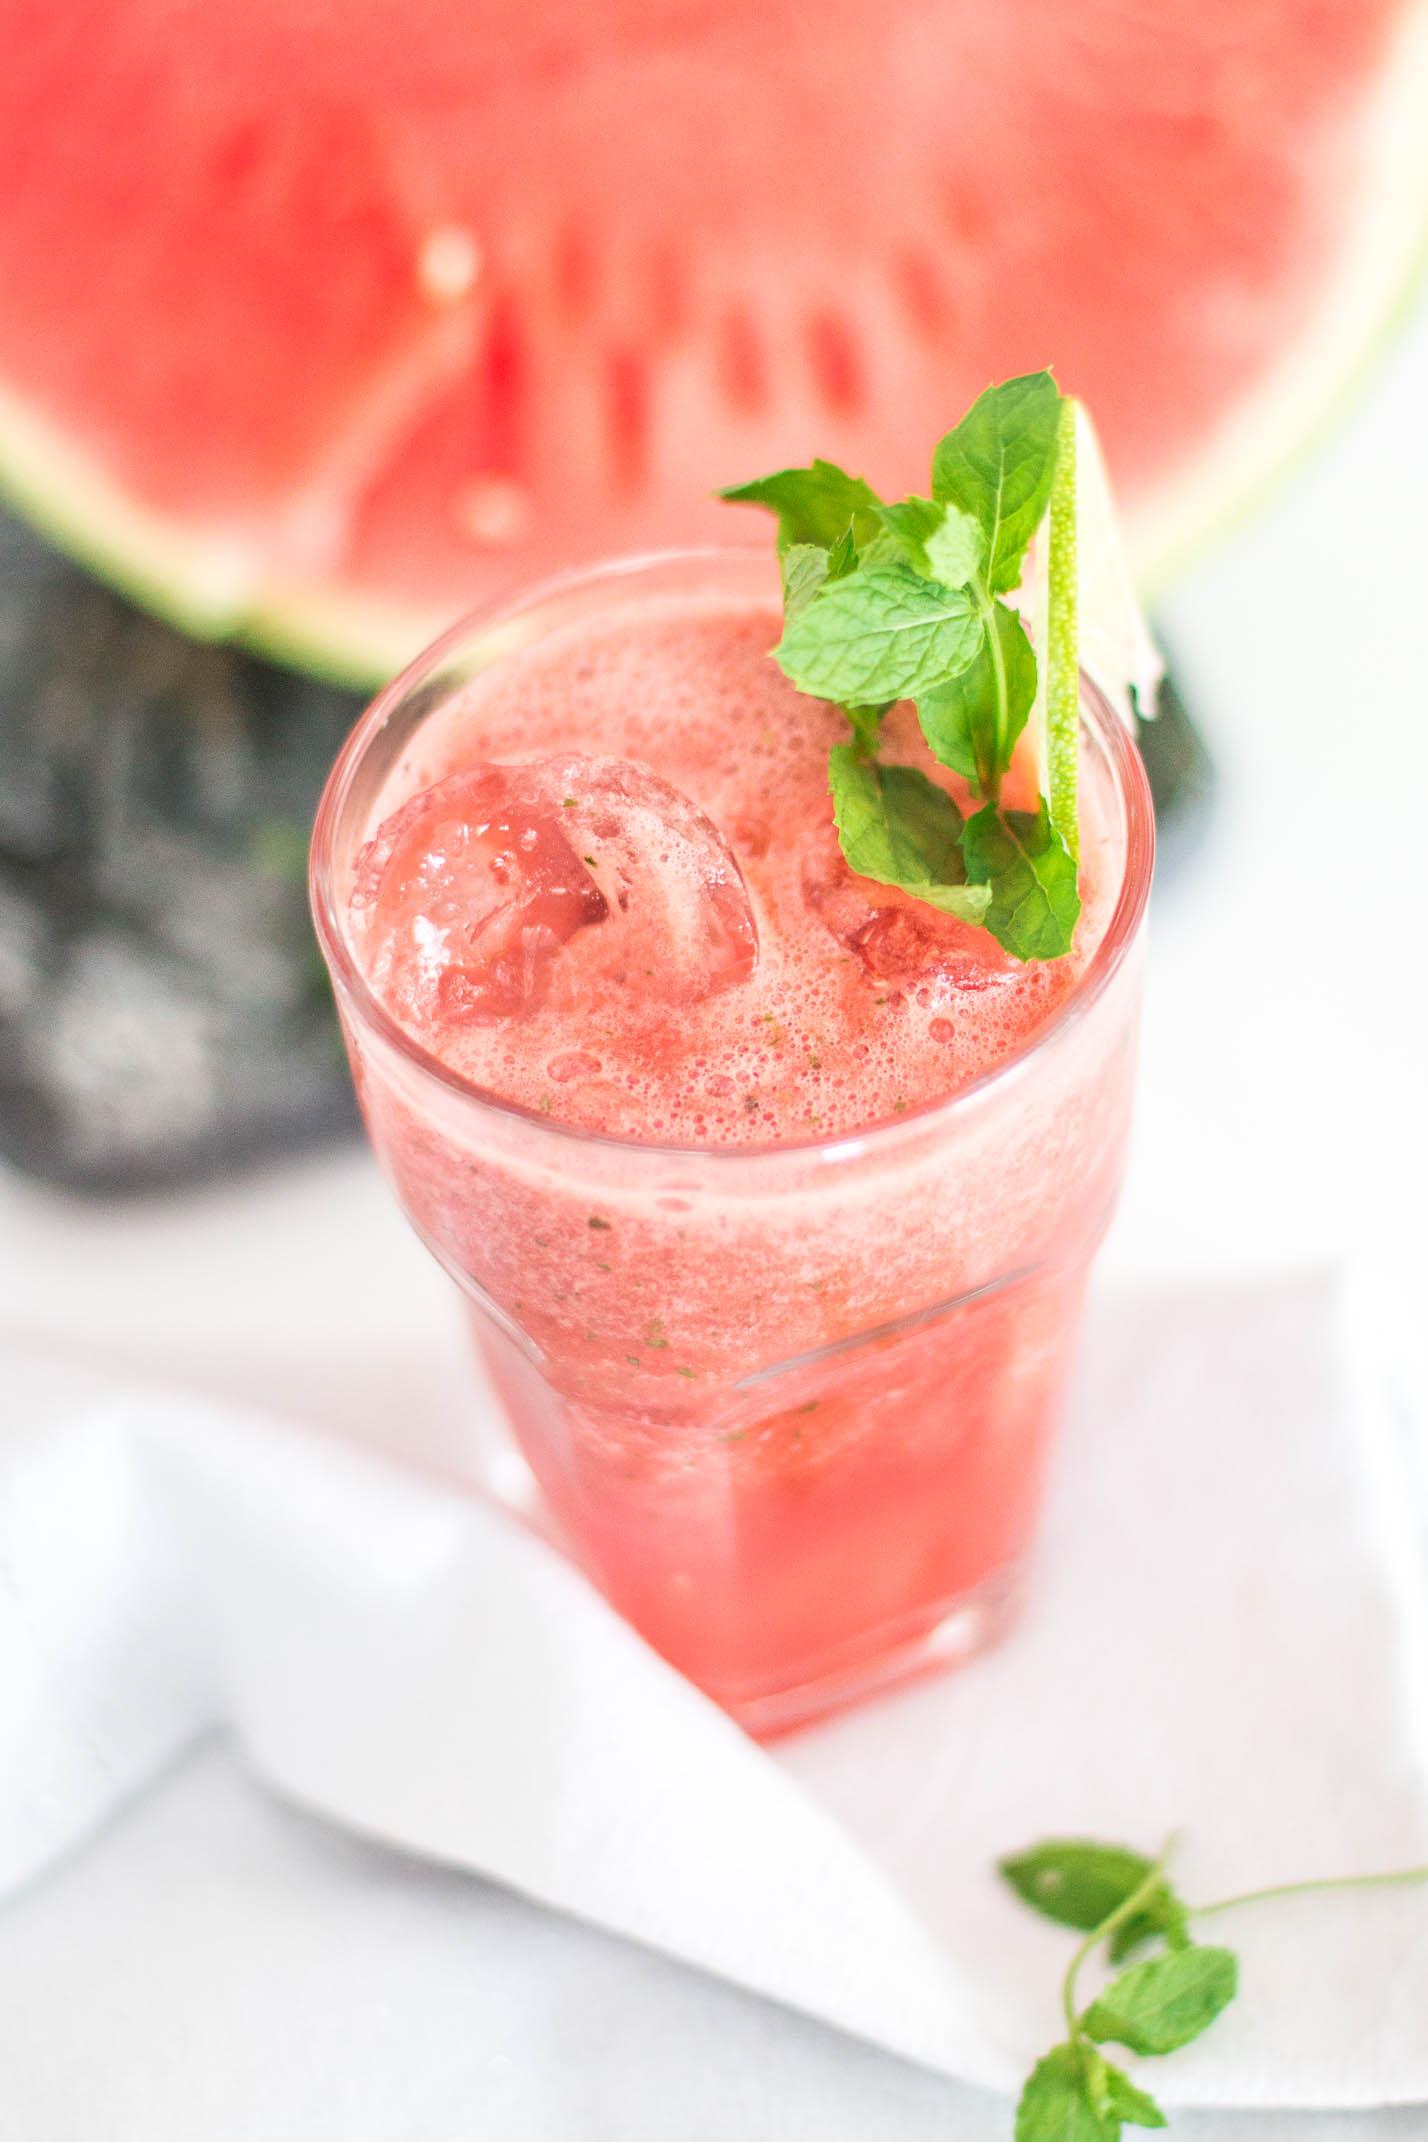 homemade watermelon juice